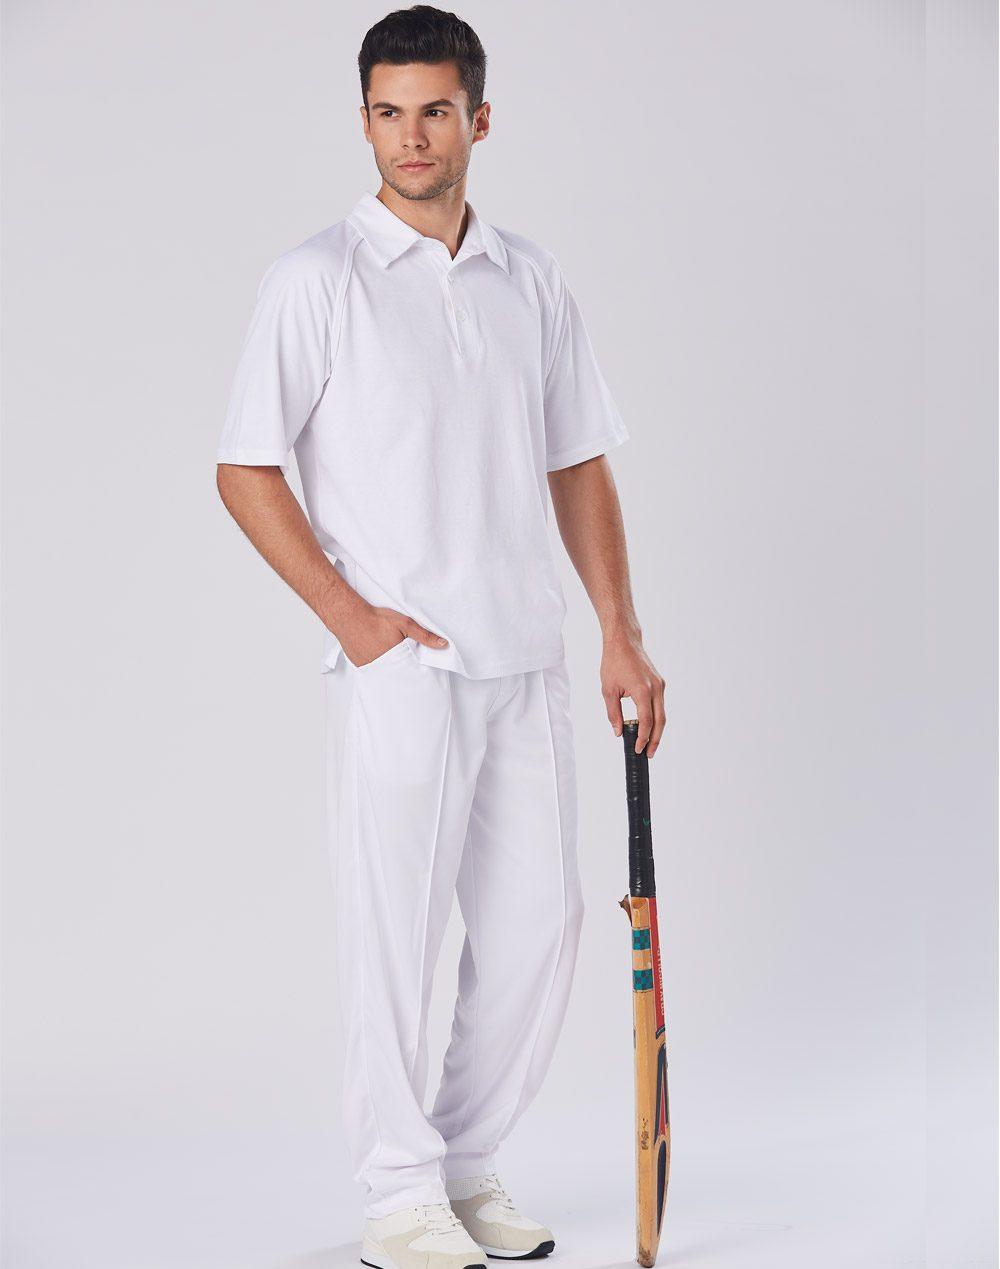 Winning Spirit CP29 Mens Cricket Pants | Fast Clothing